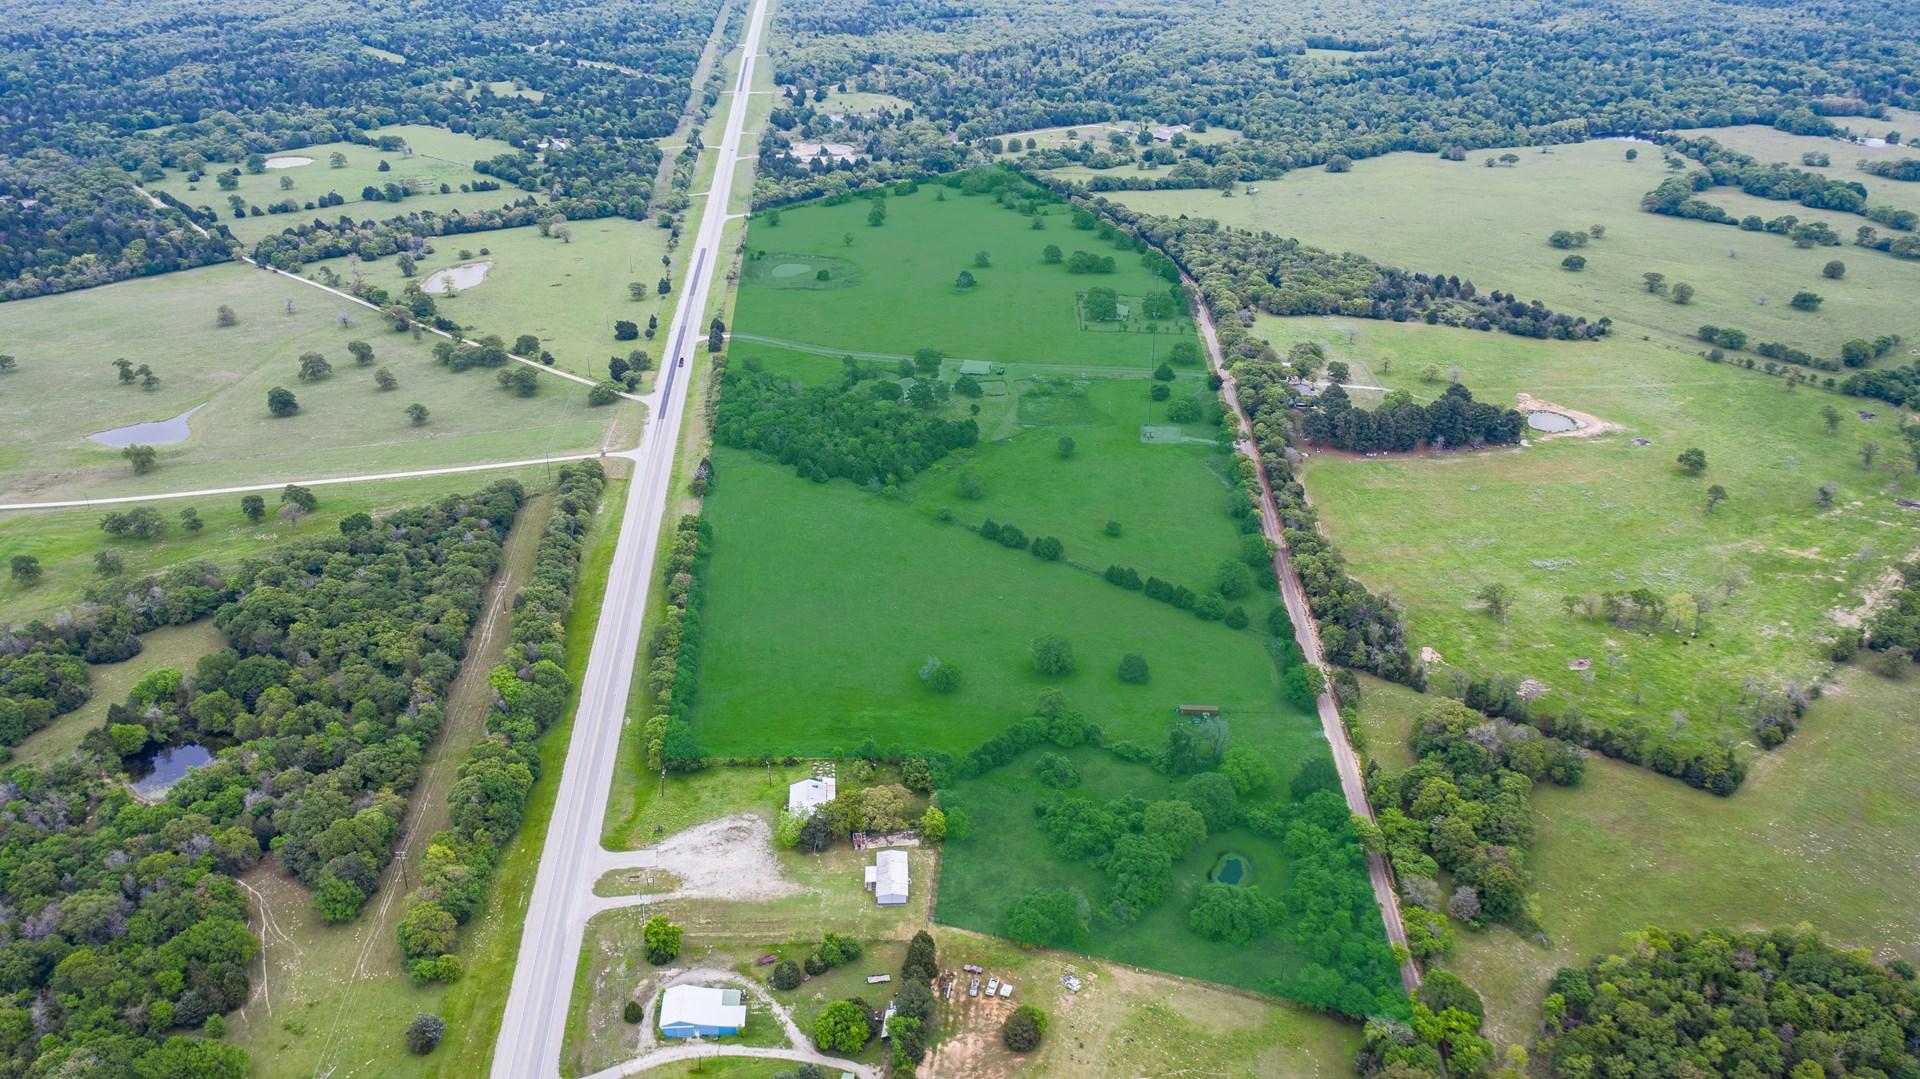 Home/Acreage For Sale - Centerville TX Leon County TX